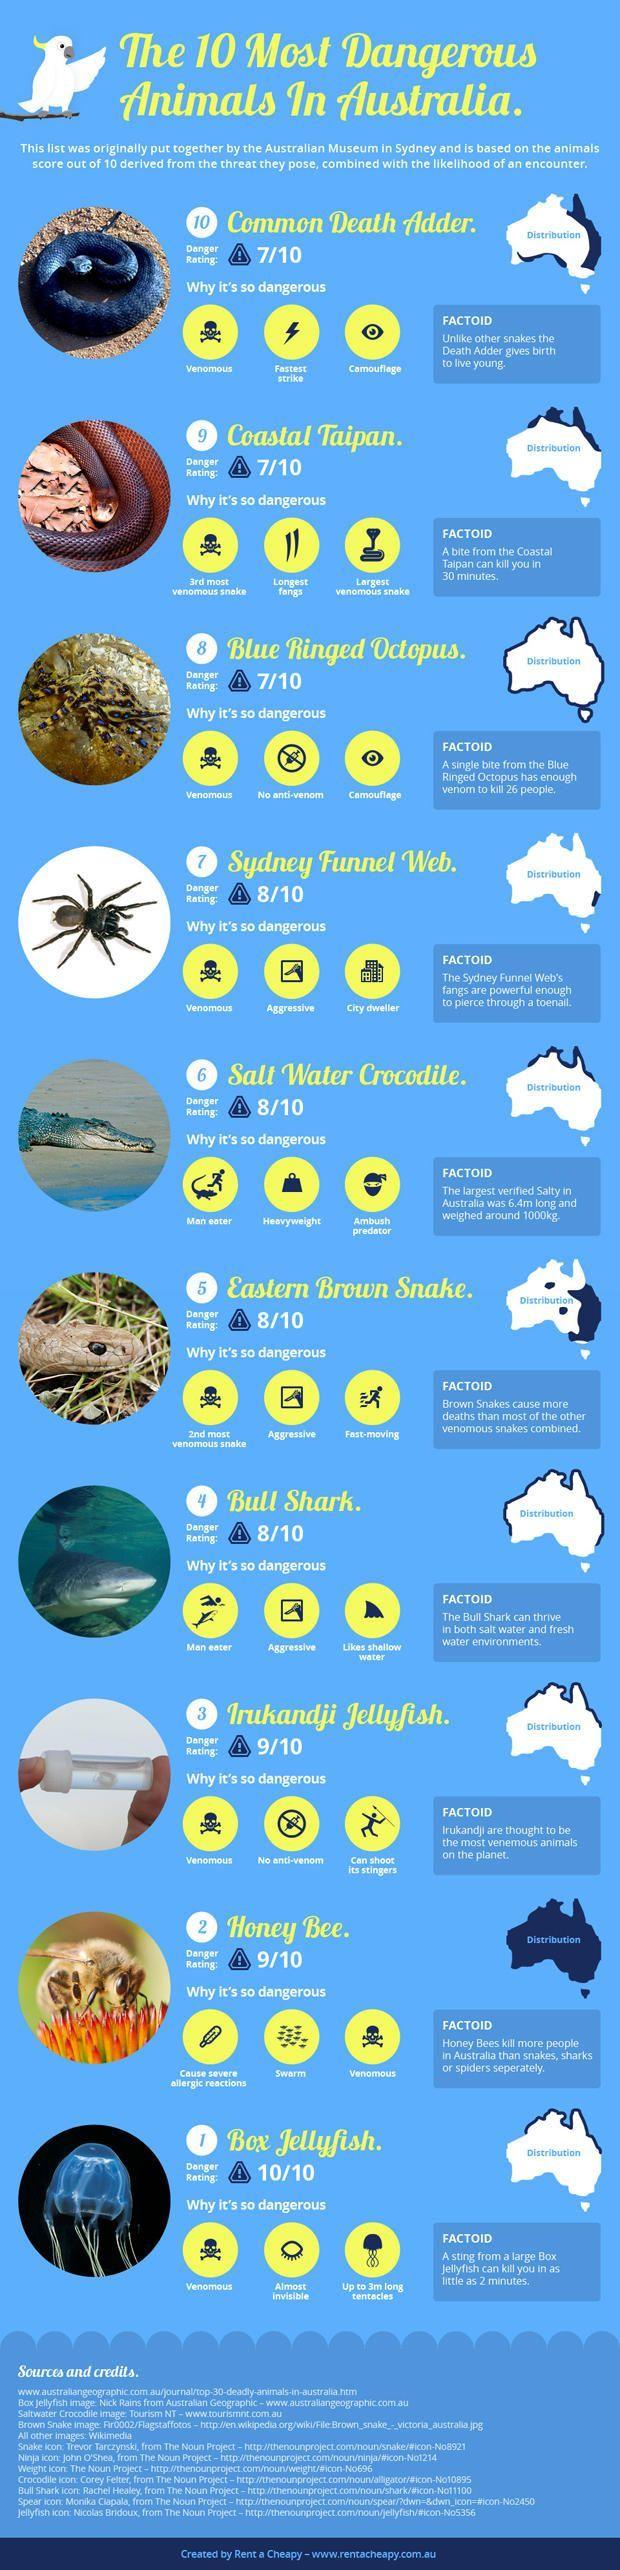 Infographic: Australia's 10 Most Dangerous Animals | Mental Floss